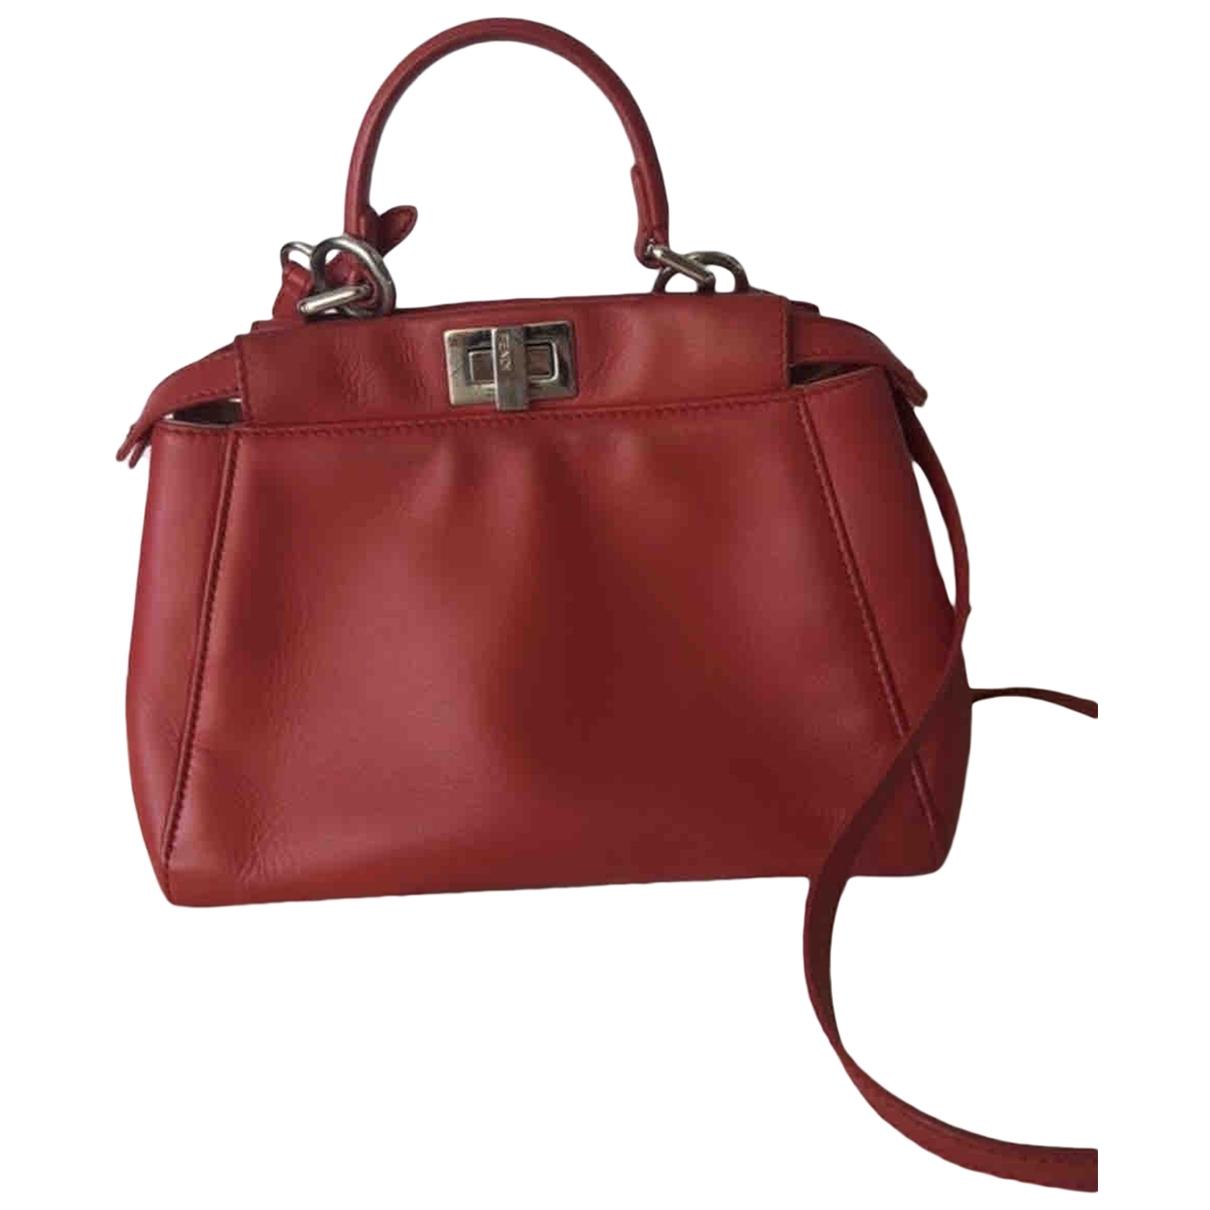 Fendi Peekaboo Burgundy Leather handbag for Women \N